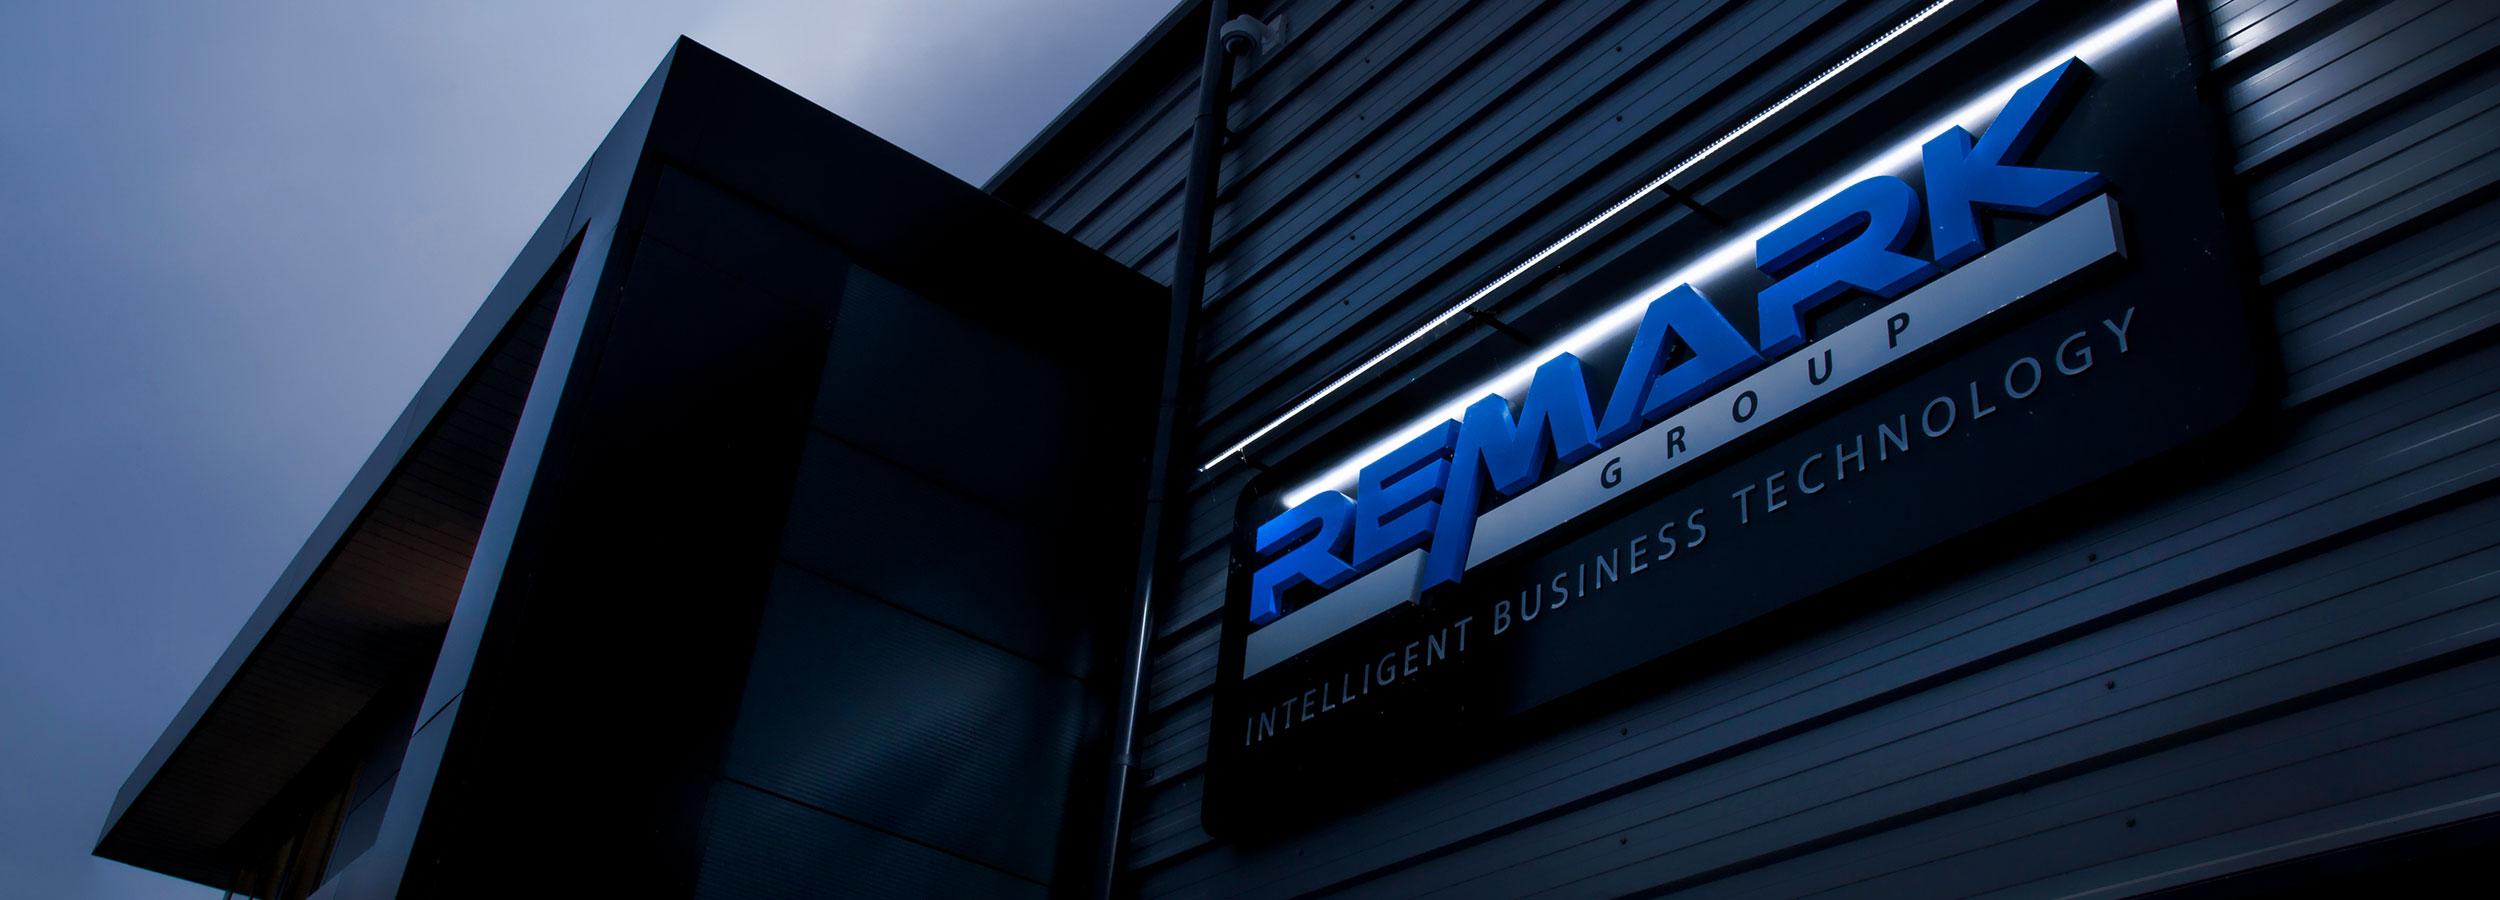 Remark HQ